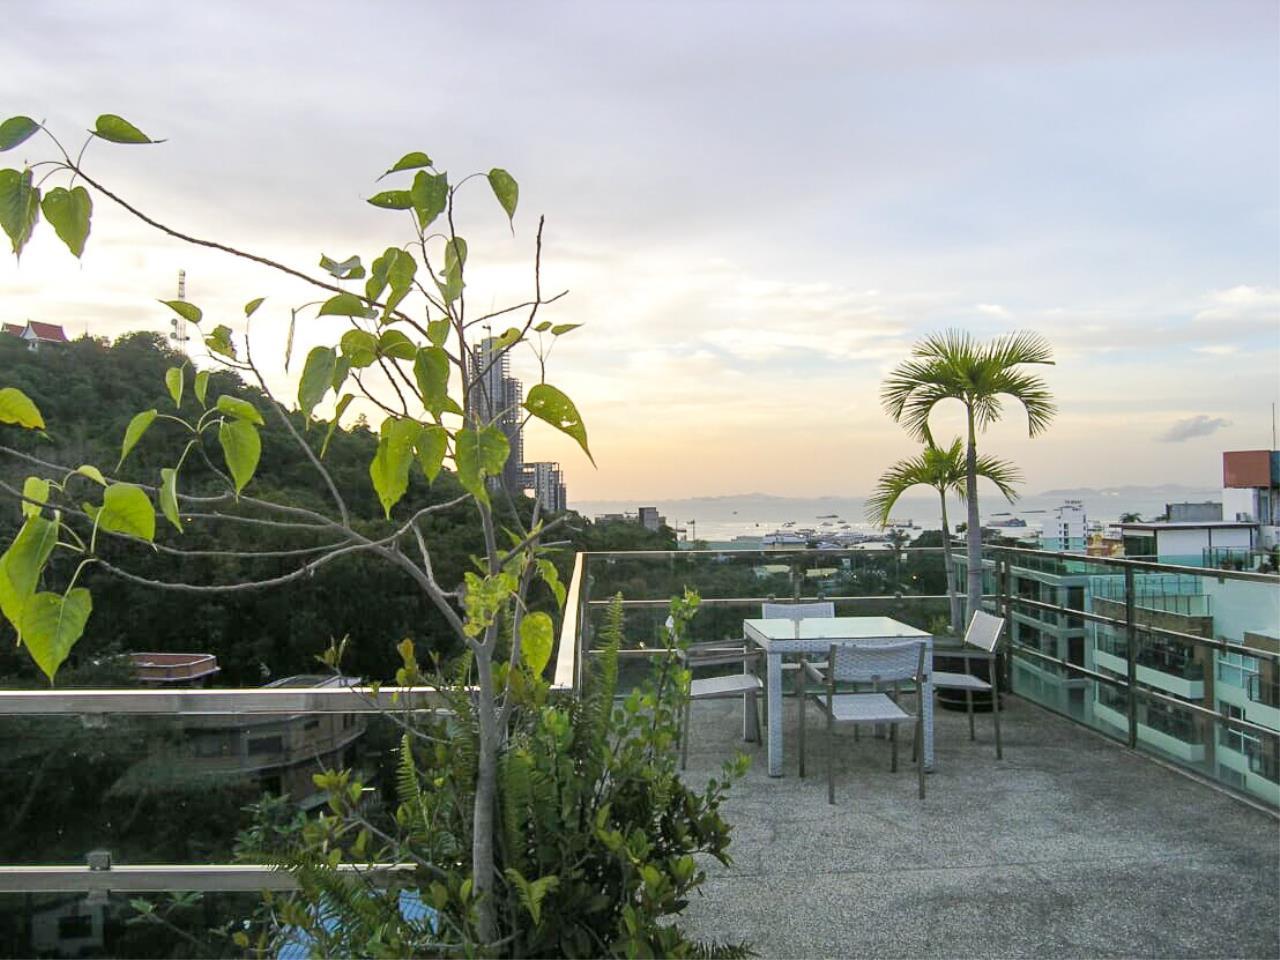 Thaiproperty1 Agency's Sea View - Penthouse Unit At Park Royal 1 - Pratamnak/Pattaya 31